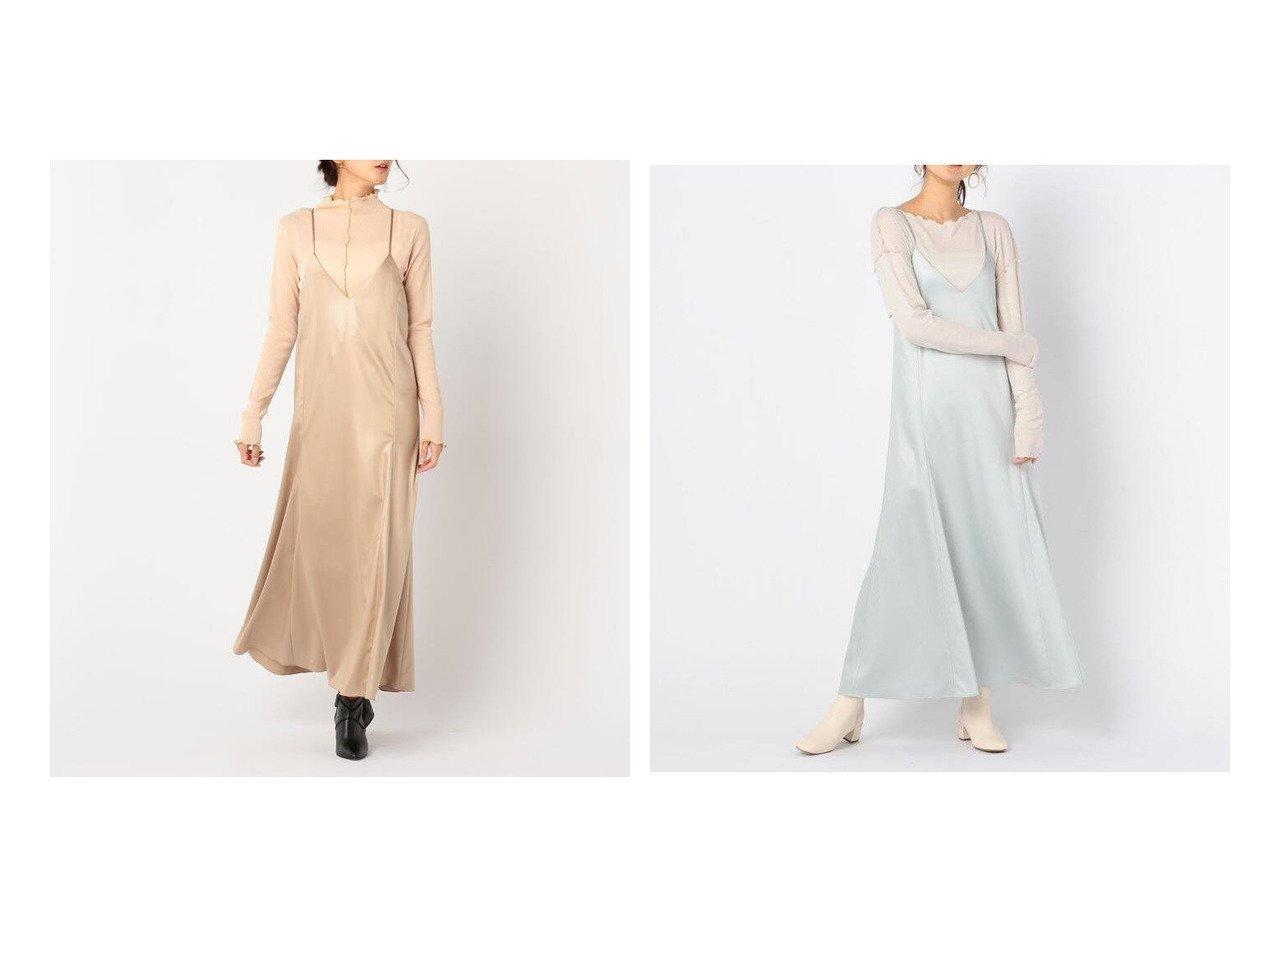 【NOLLEY'S sophi/ノーリーズソフィー】のレザーライクサテンキャミワンピース ワンピース・ドレスのおすすめ!人気、レディースファッションの通販  おすすめで人気のファッション通販商品 インテリア・家具・キッズファッション・メンズファッション・レディースファッション・服の通販 founy(ファニー) https://founy.com/ ファッション Fashion レディース WOMEN ワンピース Dress キャミワンピース No Sleeve Dresses キャミワンピース |ID:crp329100000004291